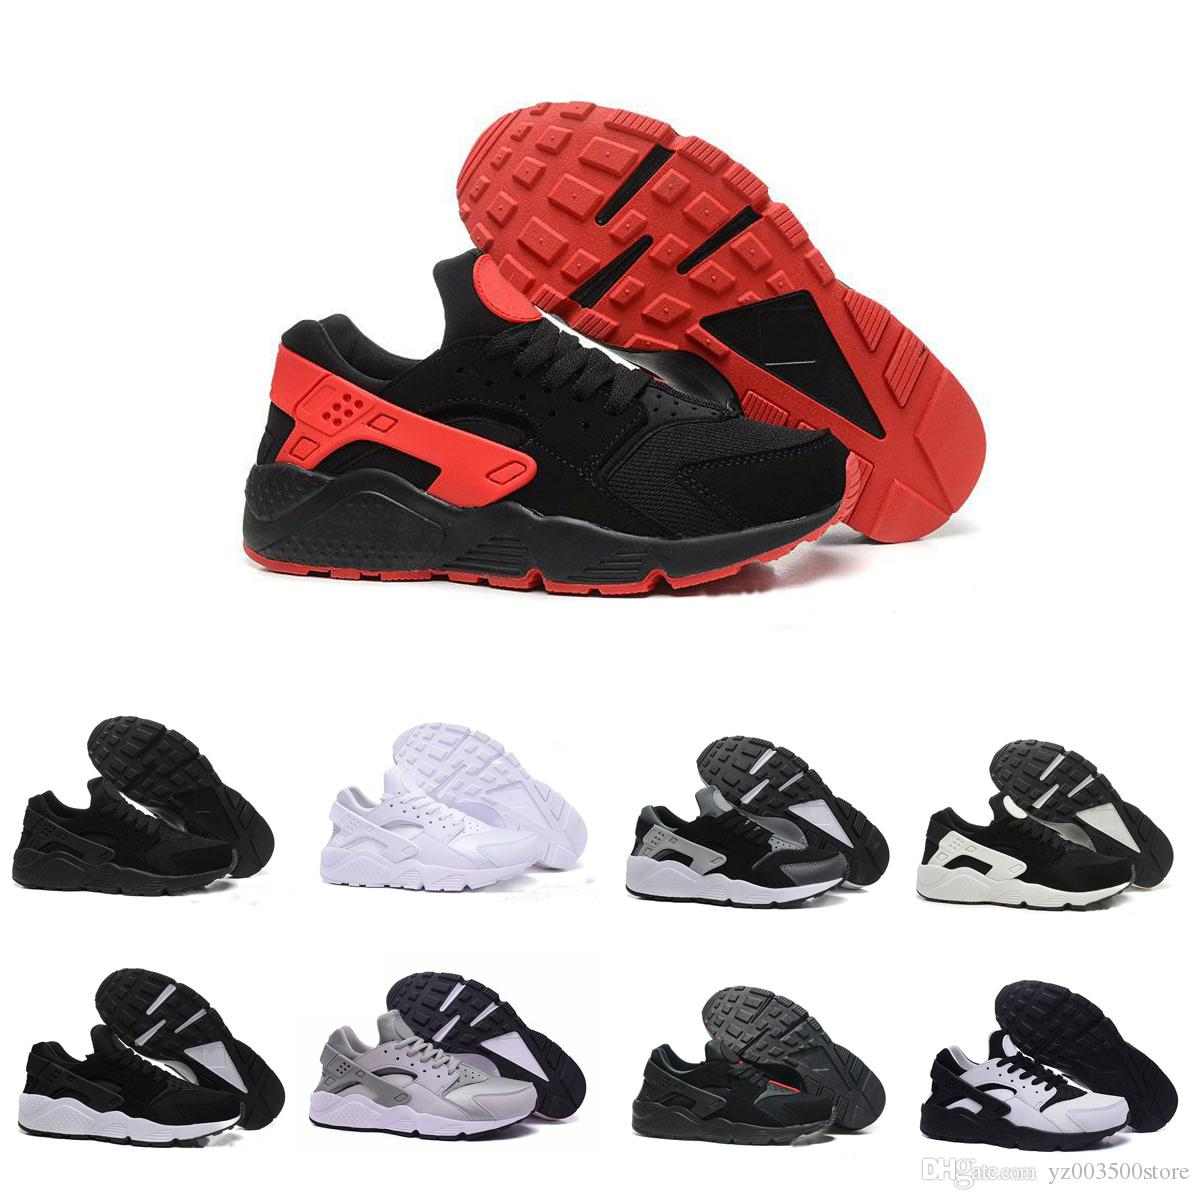 133adbea806 ... usa compre 2018 nike air huarache 1 iv para hombre mujer zapatillas de  running classic triple